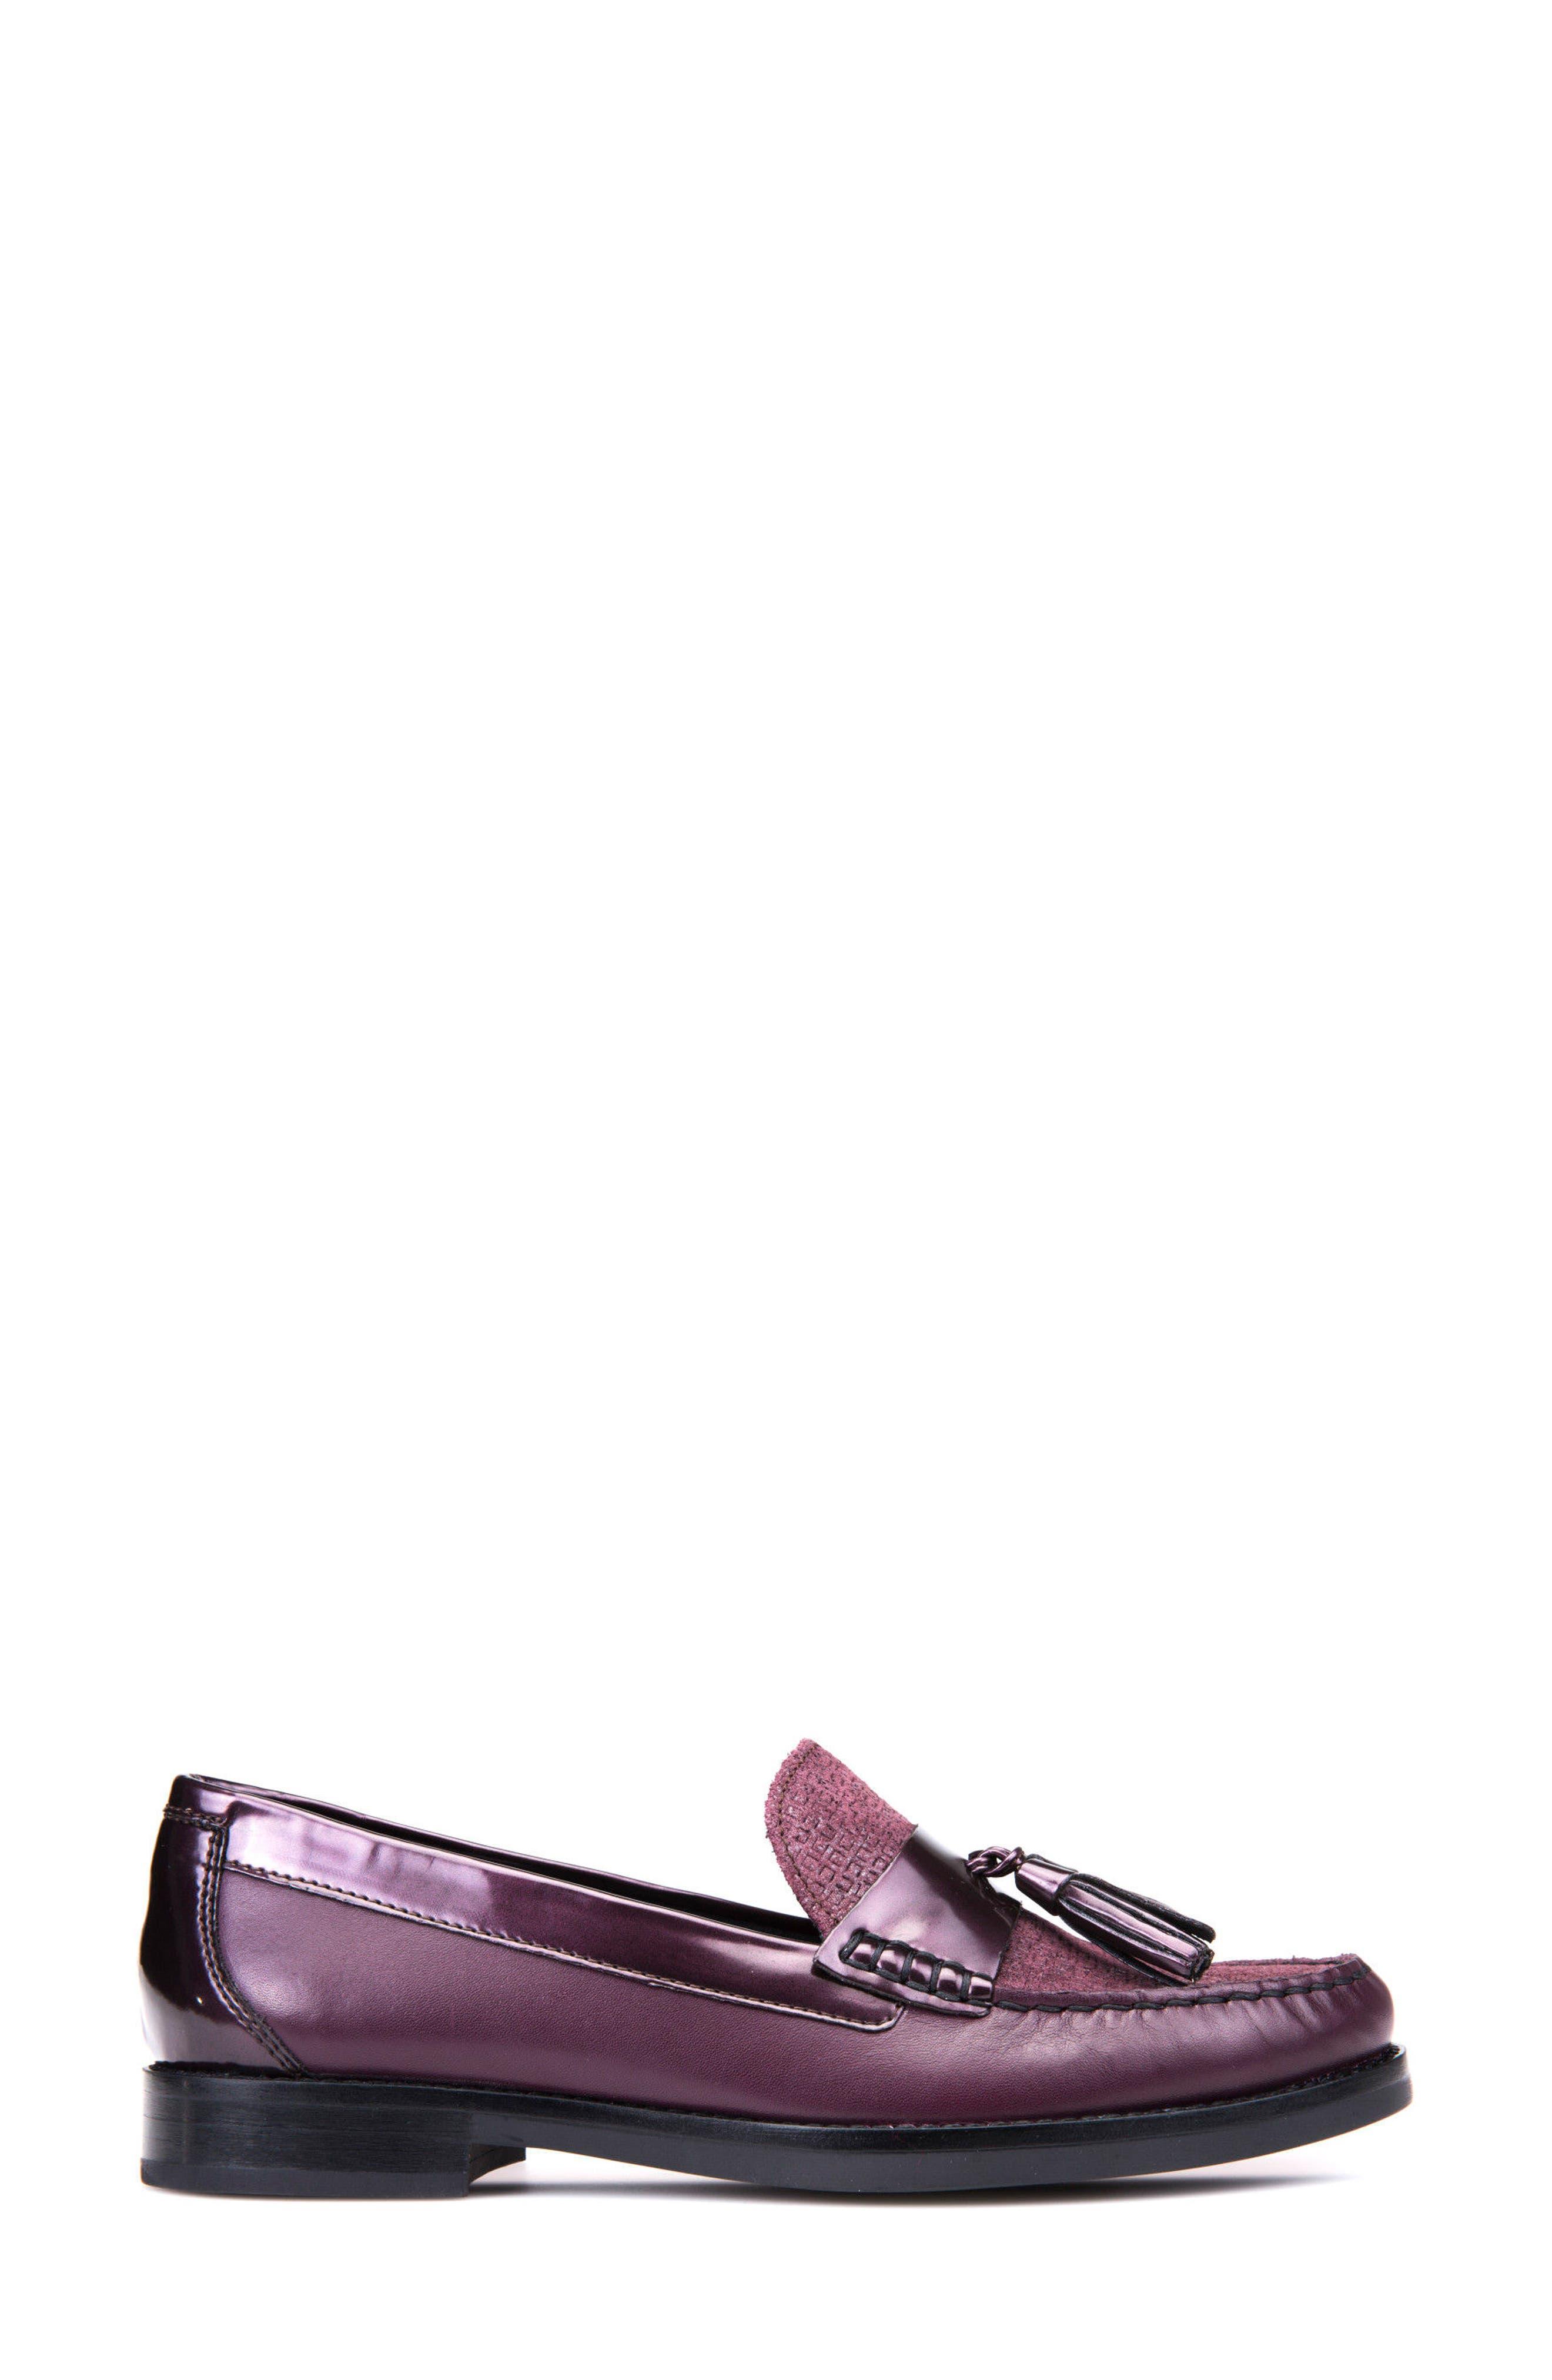 Promethea Loafer,                             Alternate thumbnail 4, color,                             Prune Leather